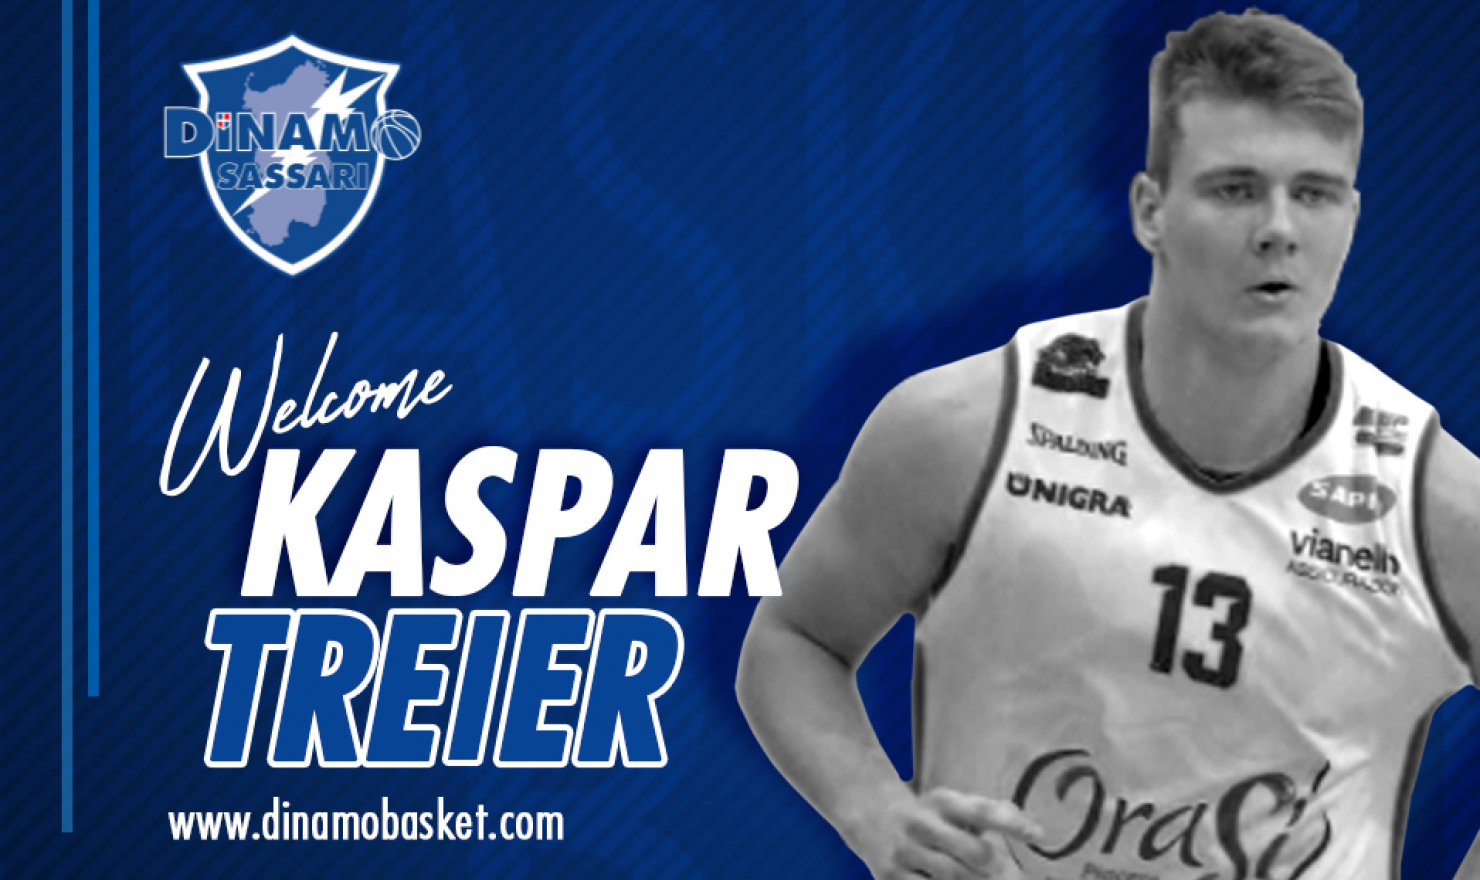 Dinamo Sassari, ufficiale l'ingaggio di Kaspar Treier